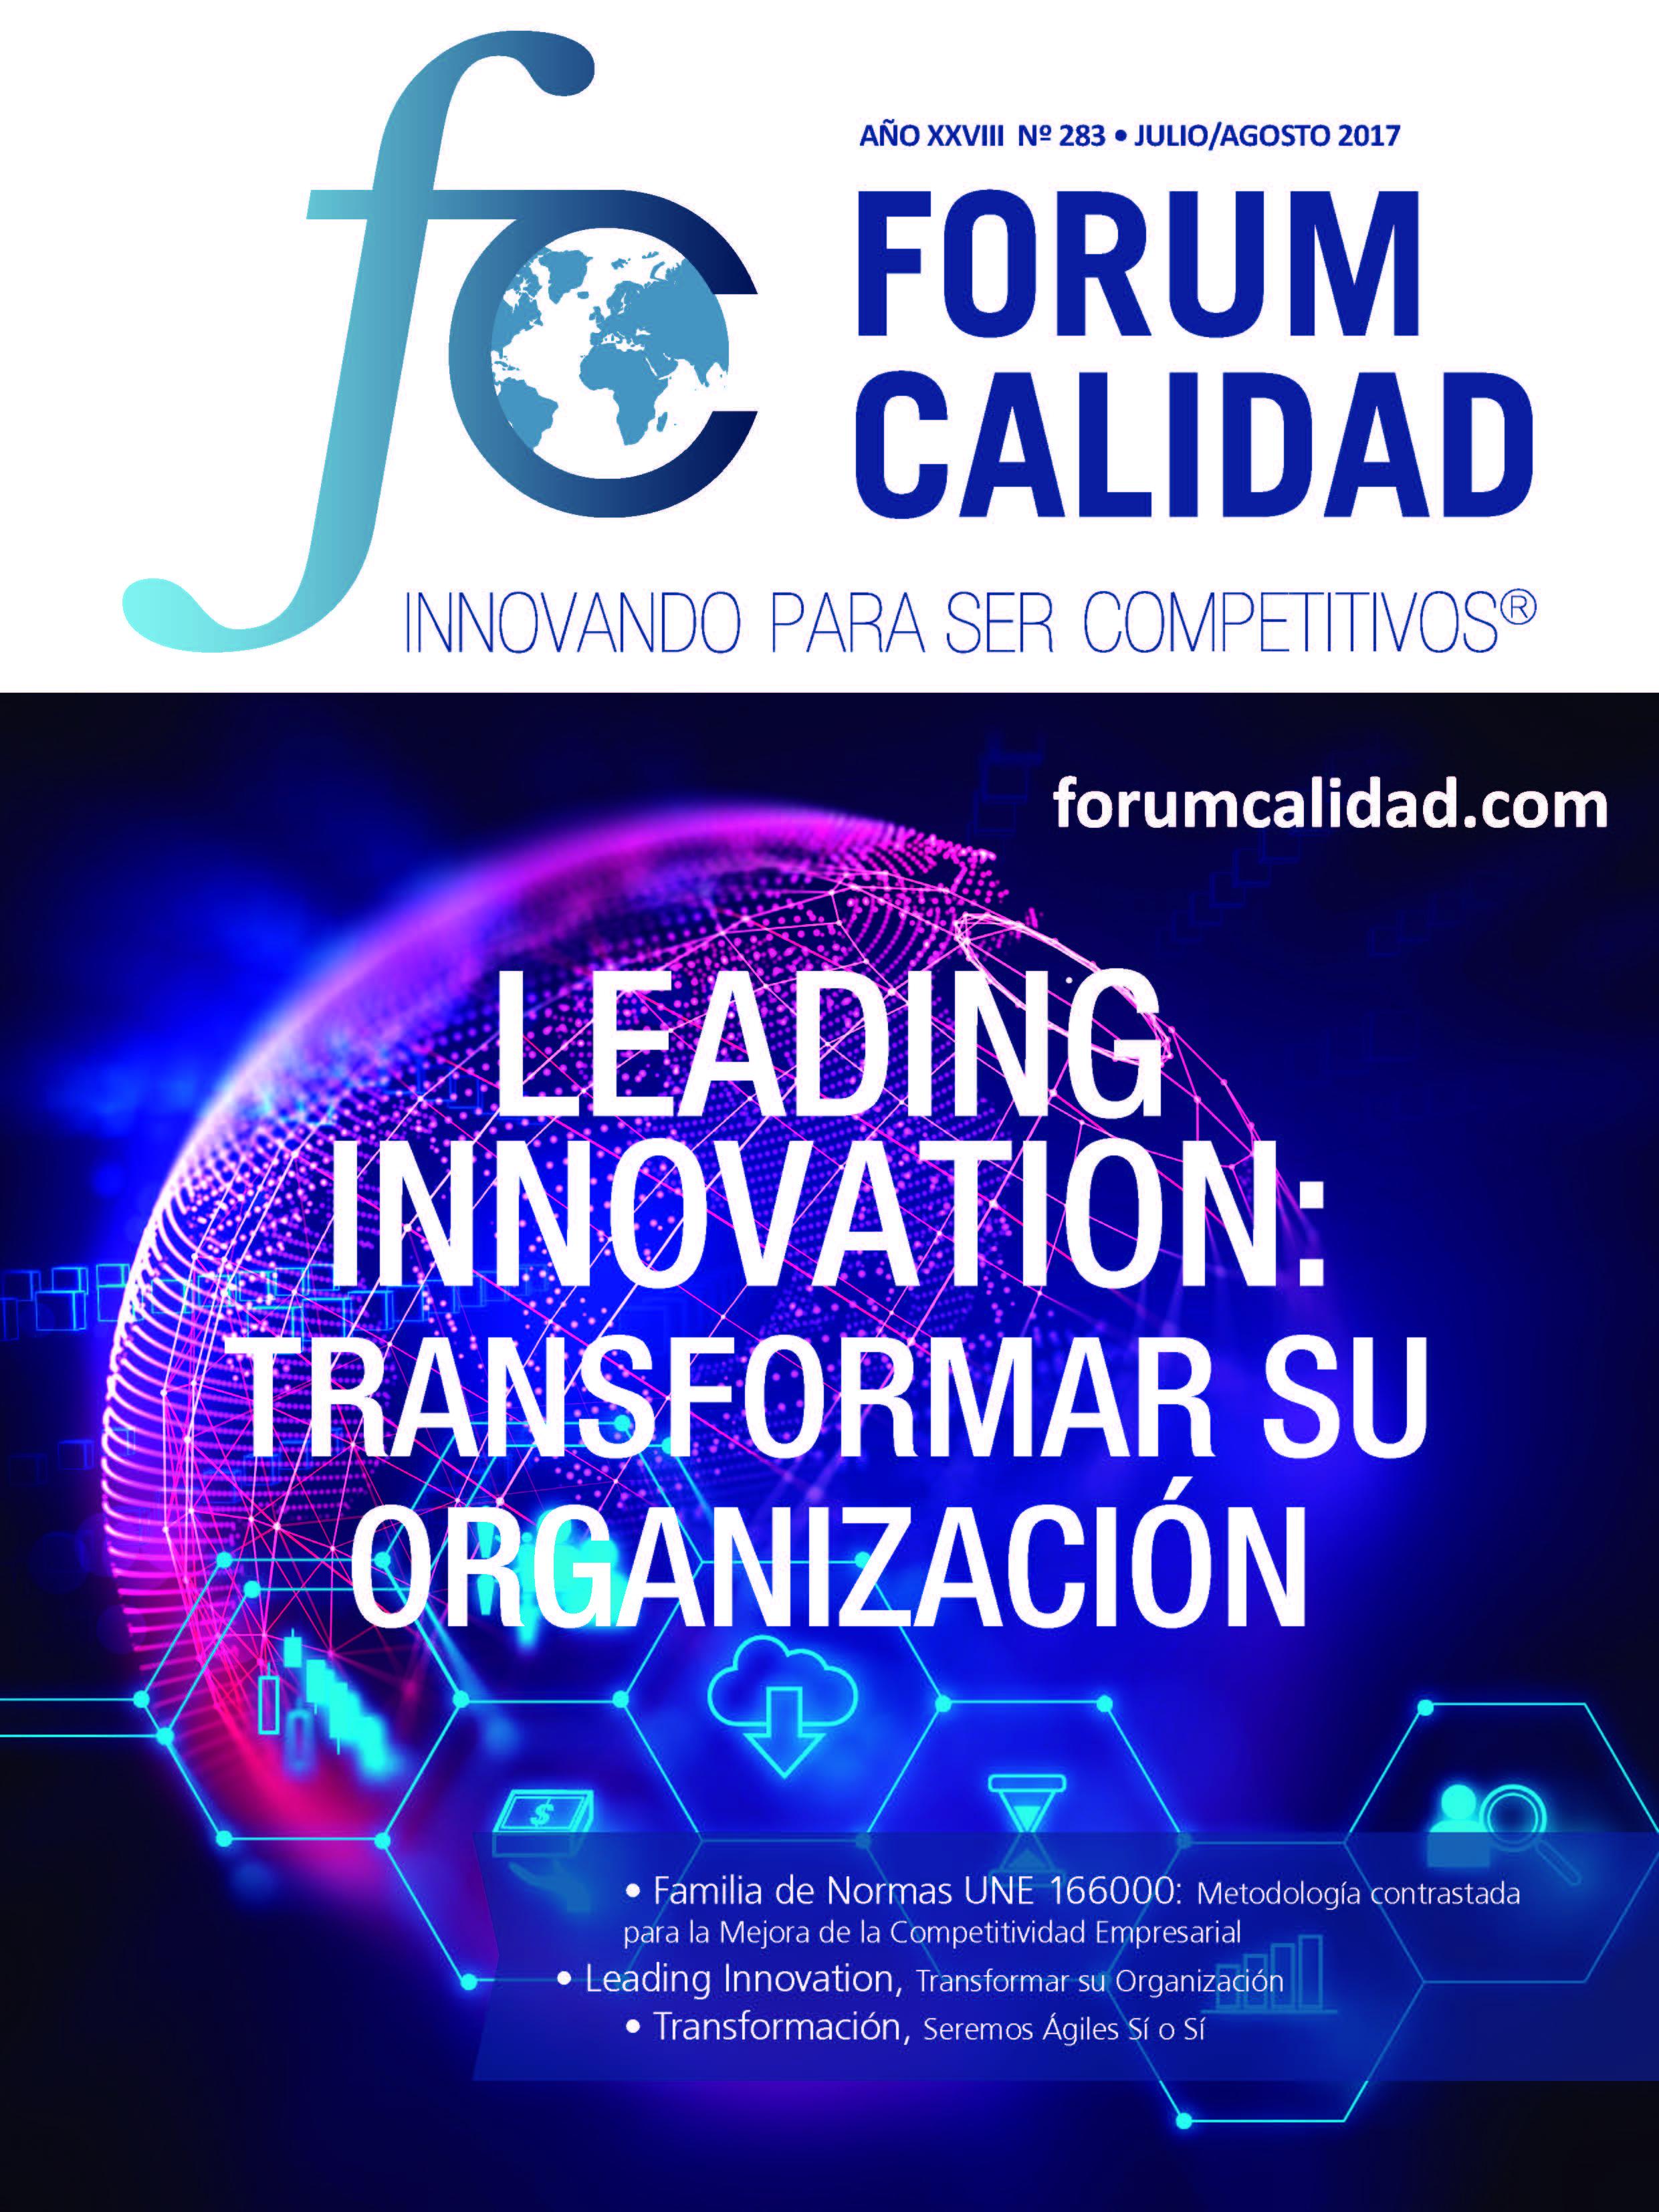 Forum Calidad nº 283 Julio 2017